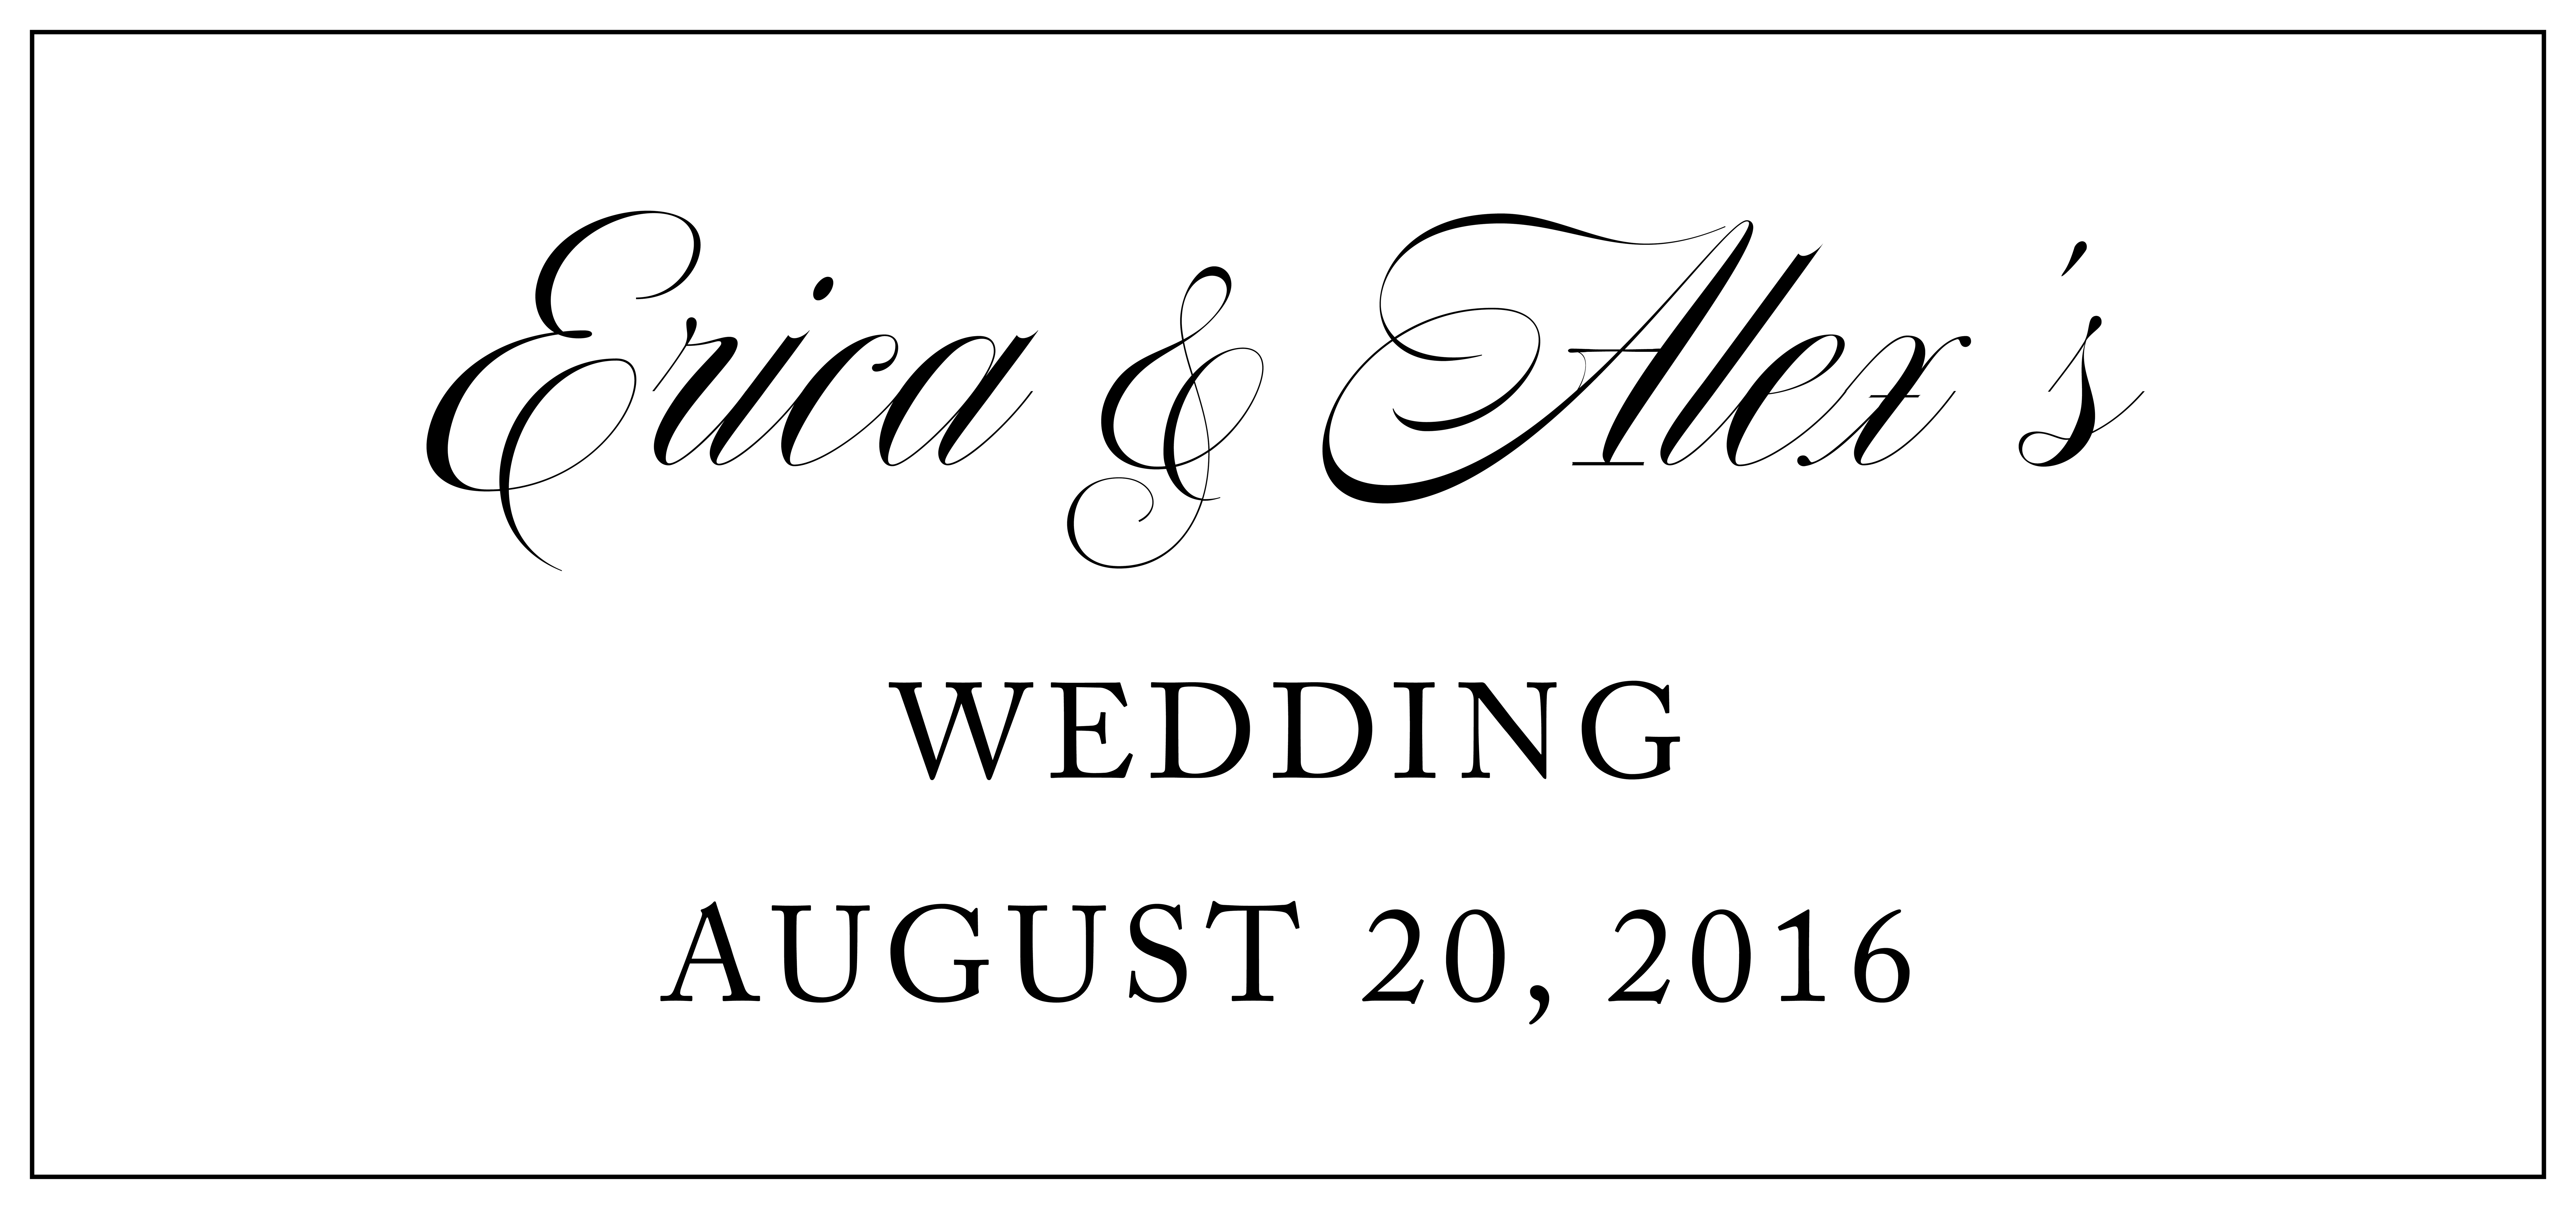 Erica & Alex Wedding Titles